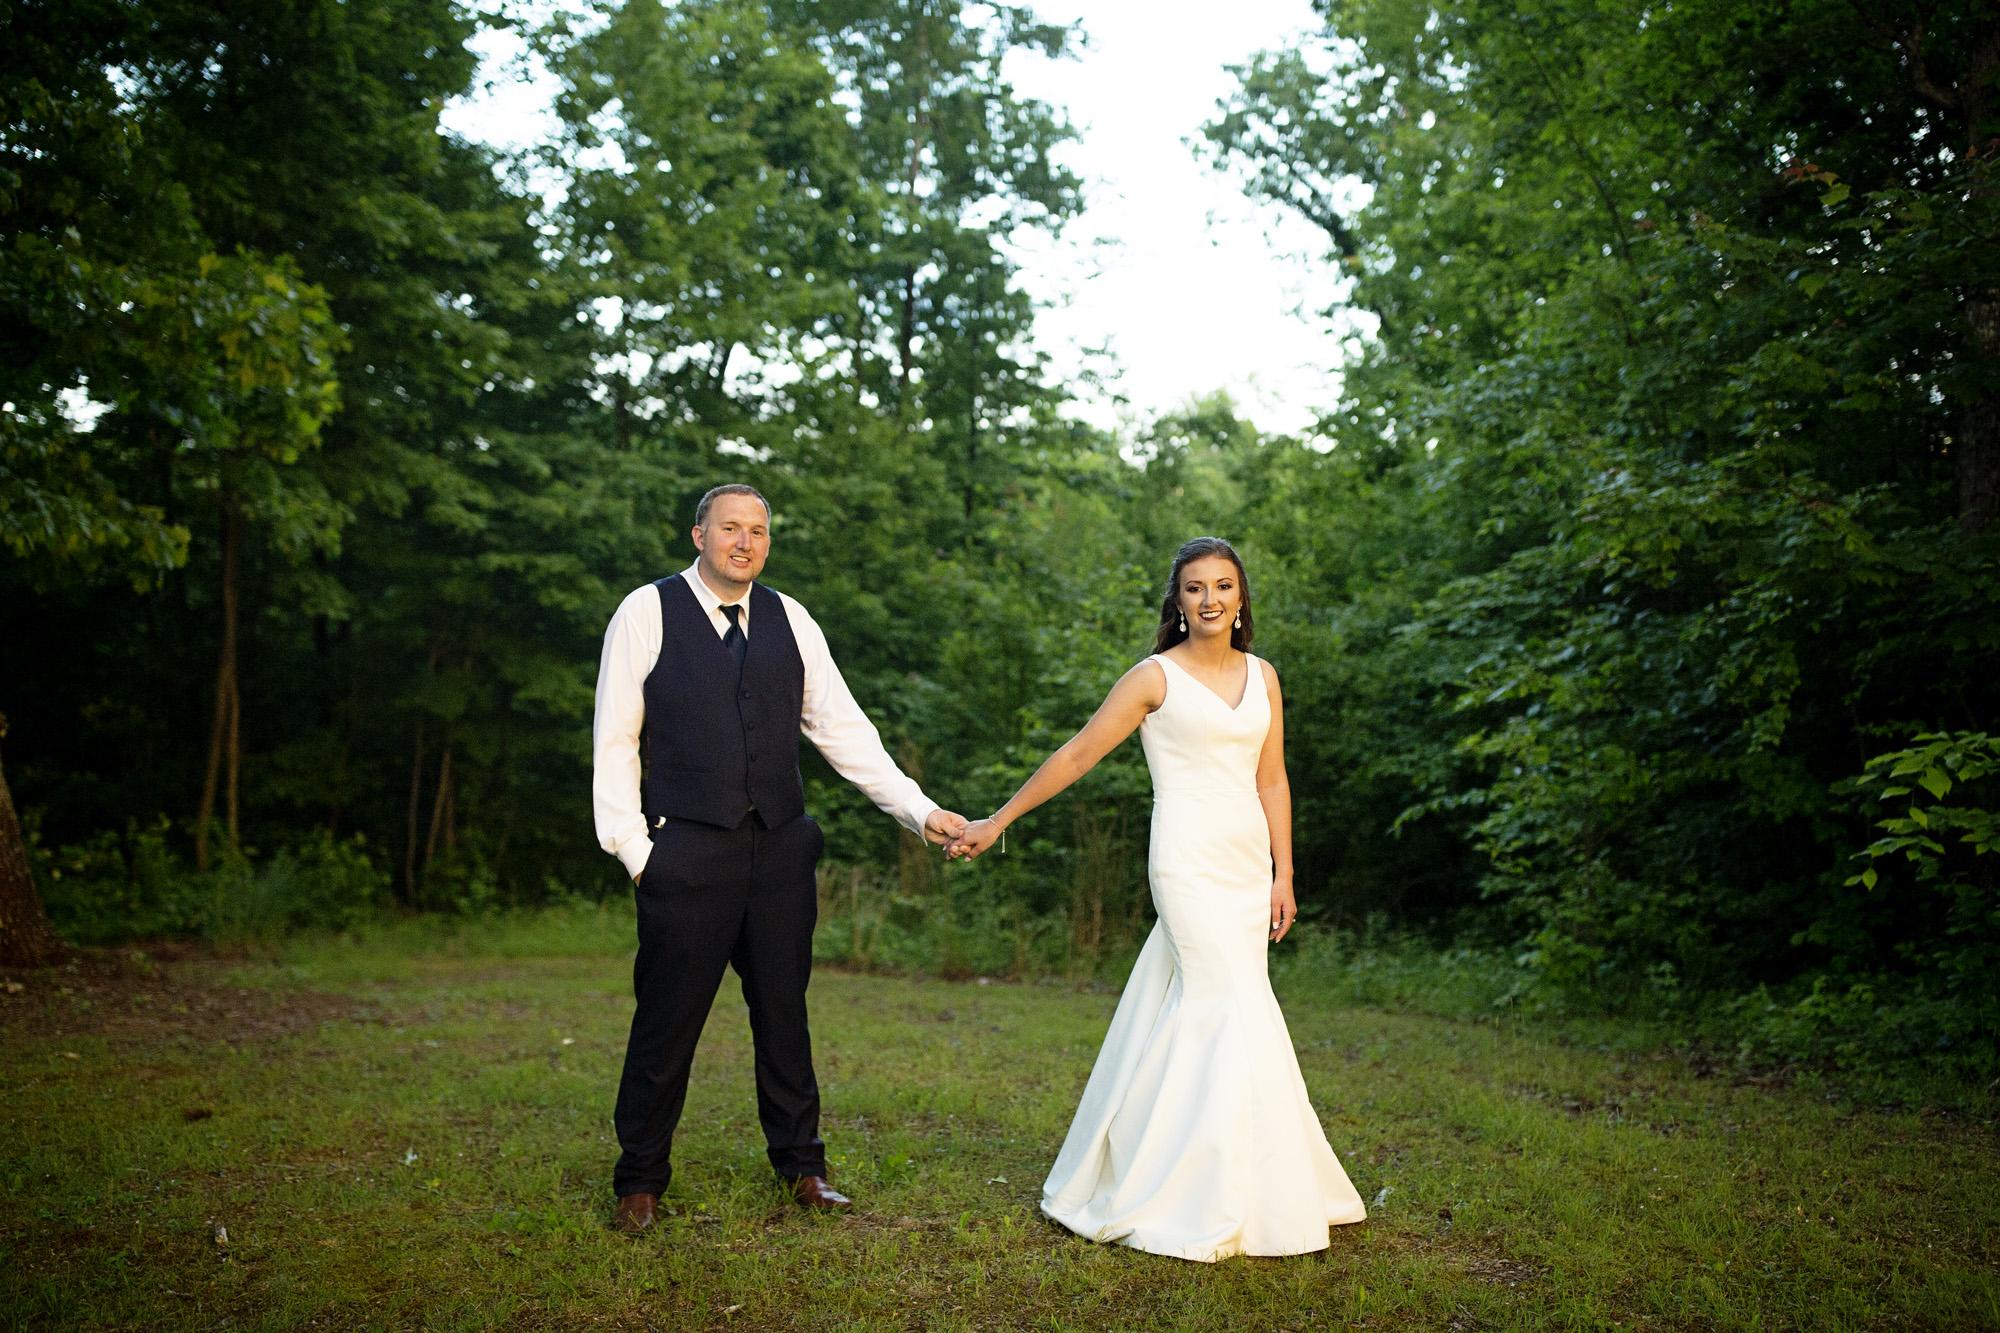 Seriously_Sabrina_Photography_Red_River_Gorge_Wedding_Barn_Robinson132.jpg